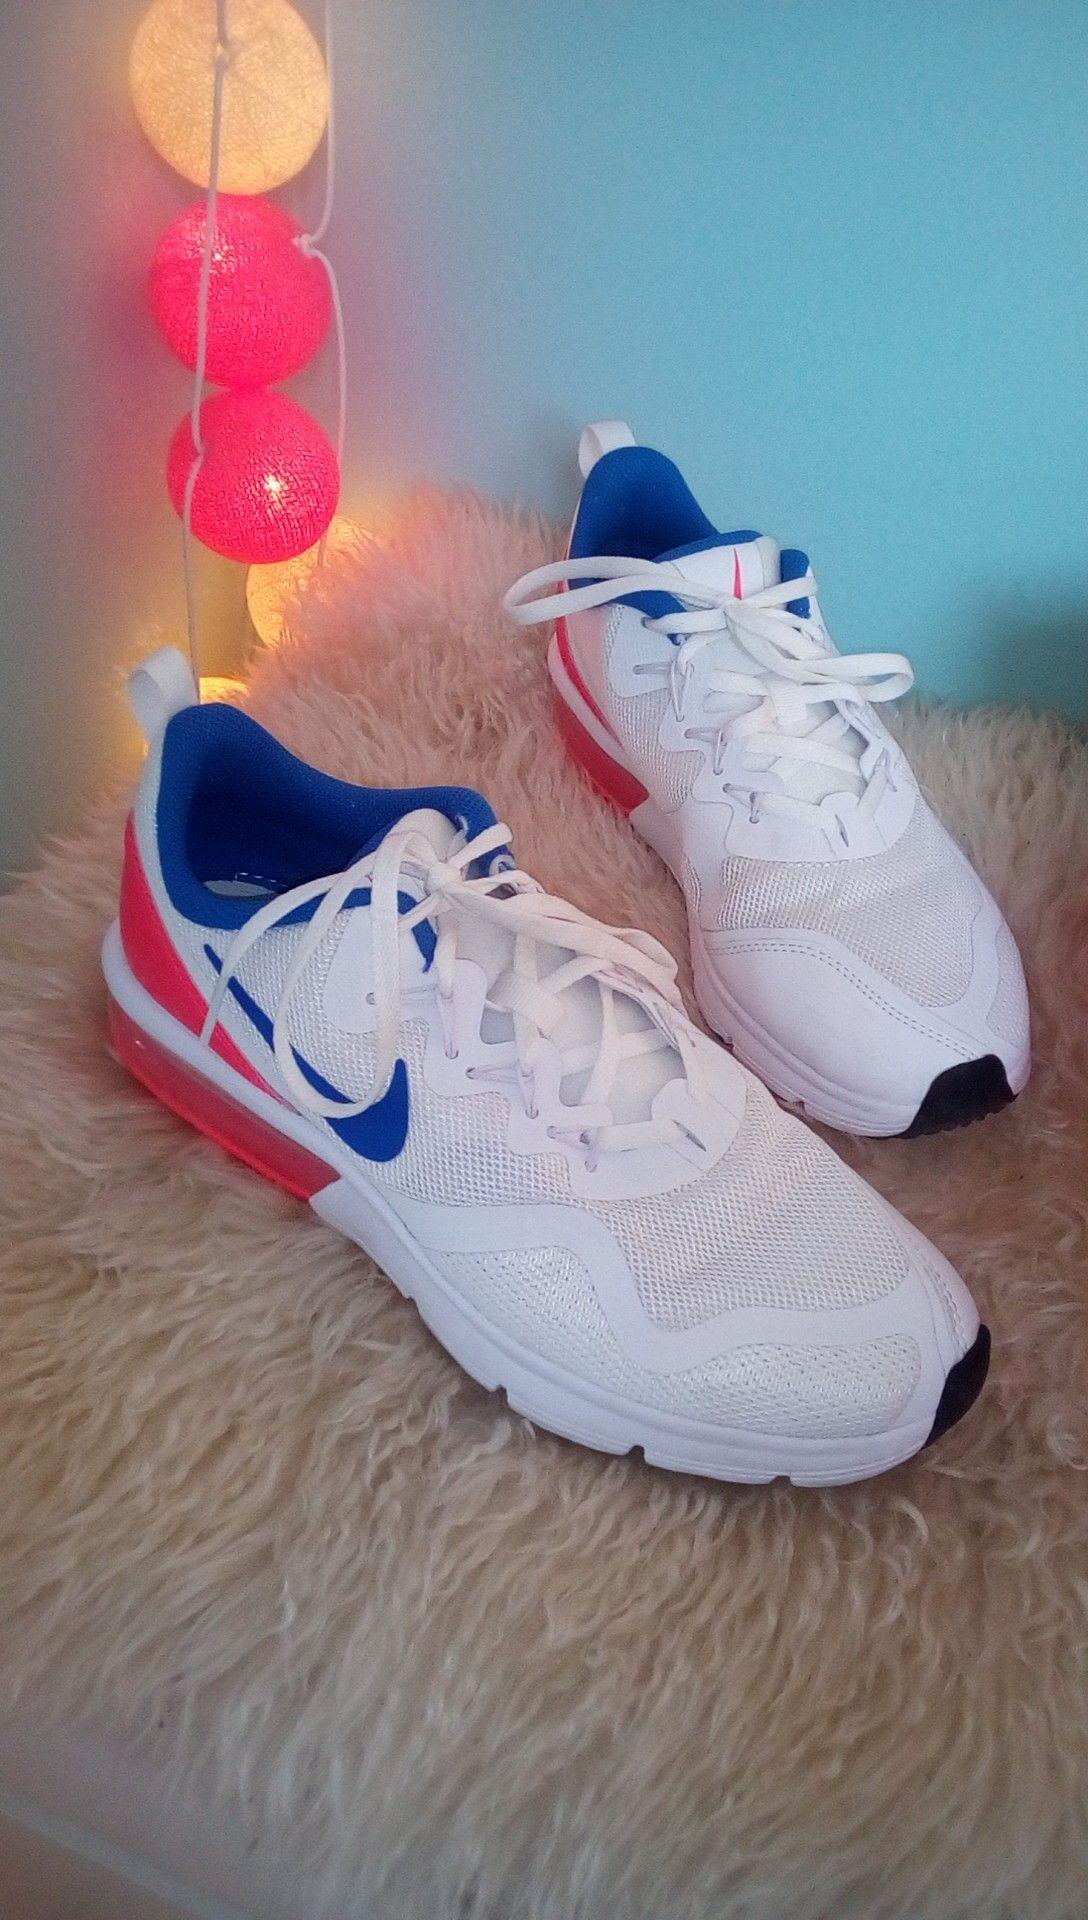 chaussure nike bleu blanc rouge